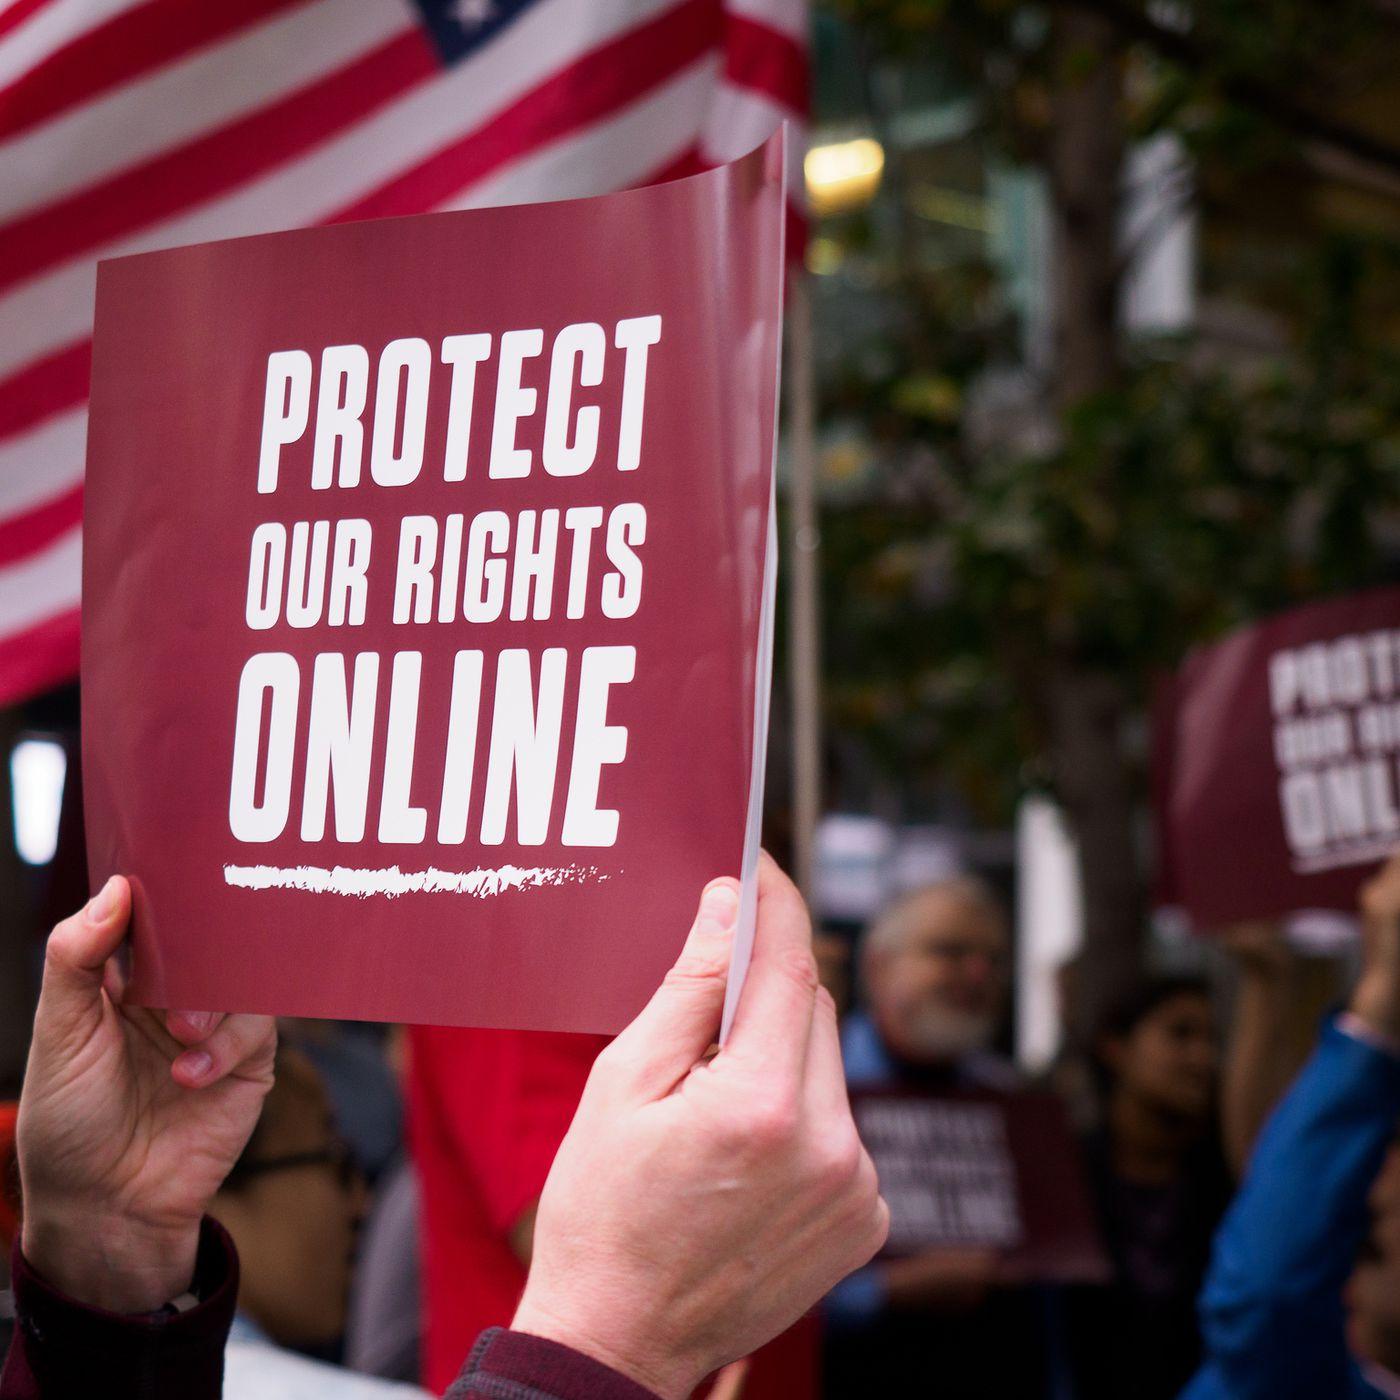 YouTube, Twitch streamers worried as net neutrality vote